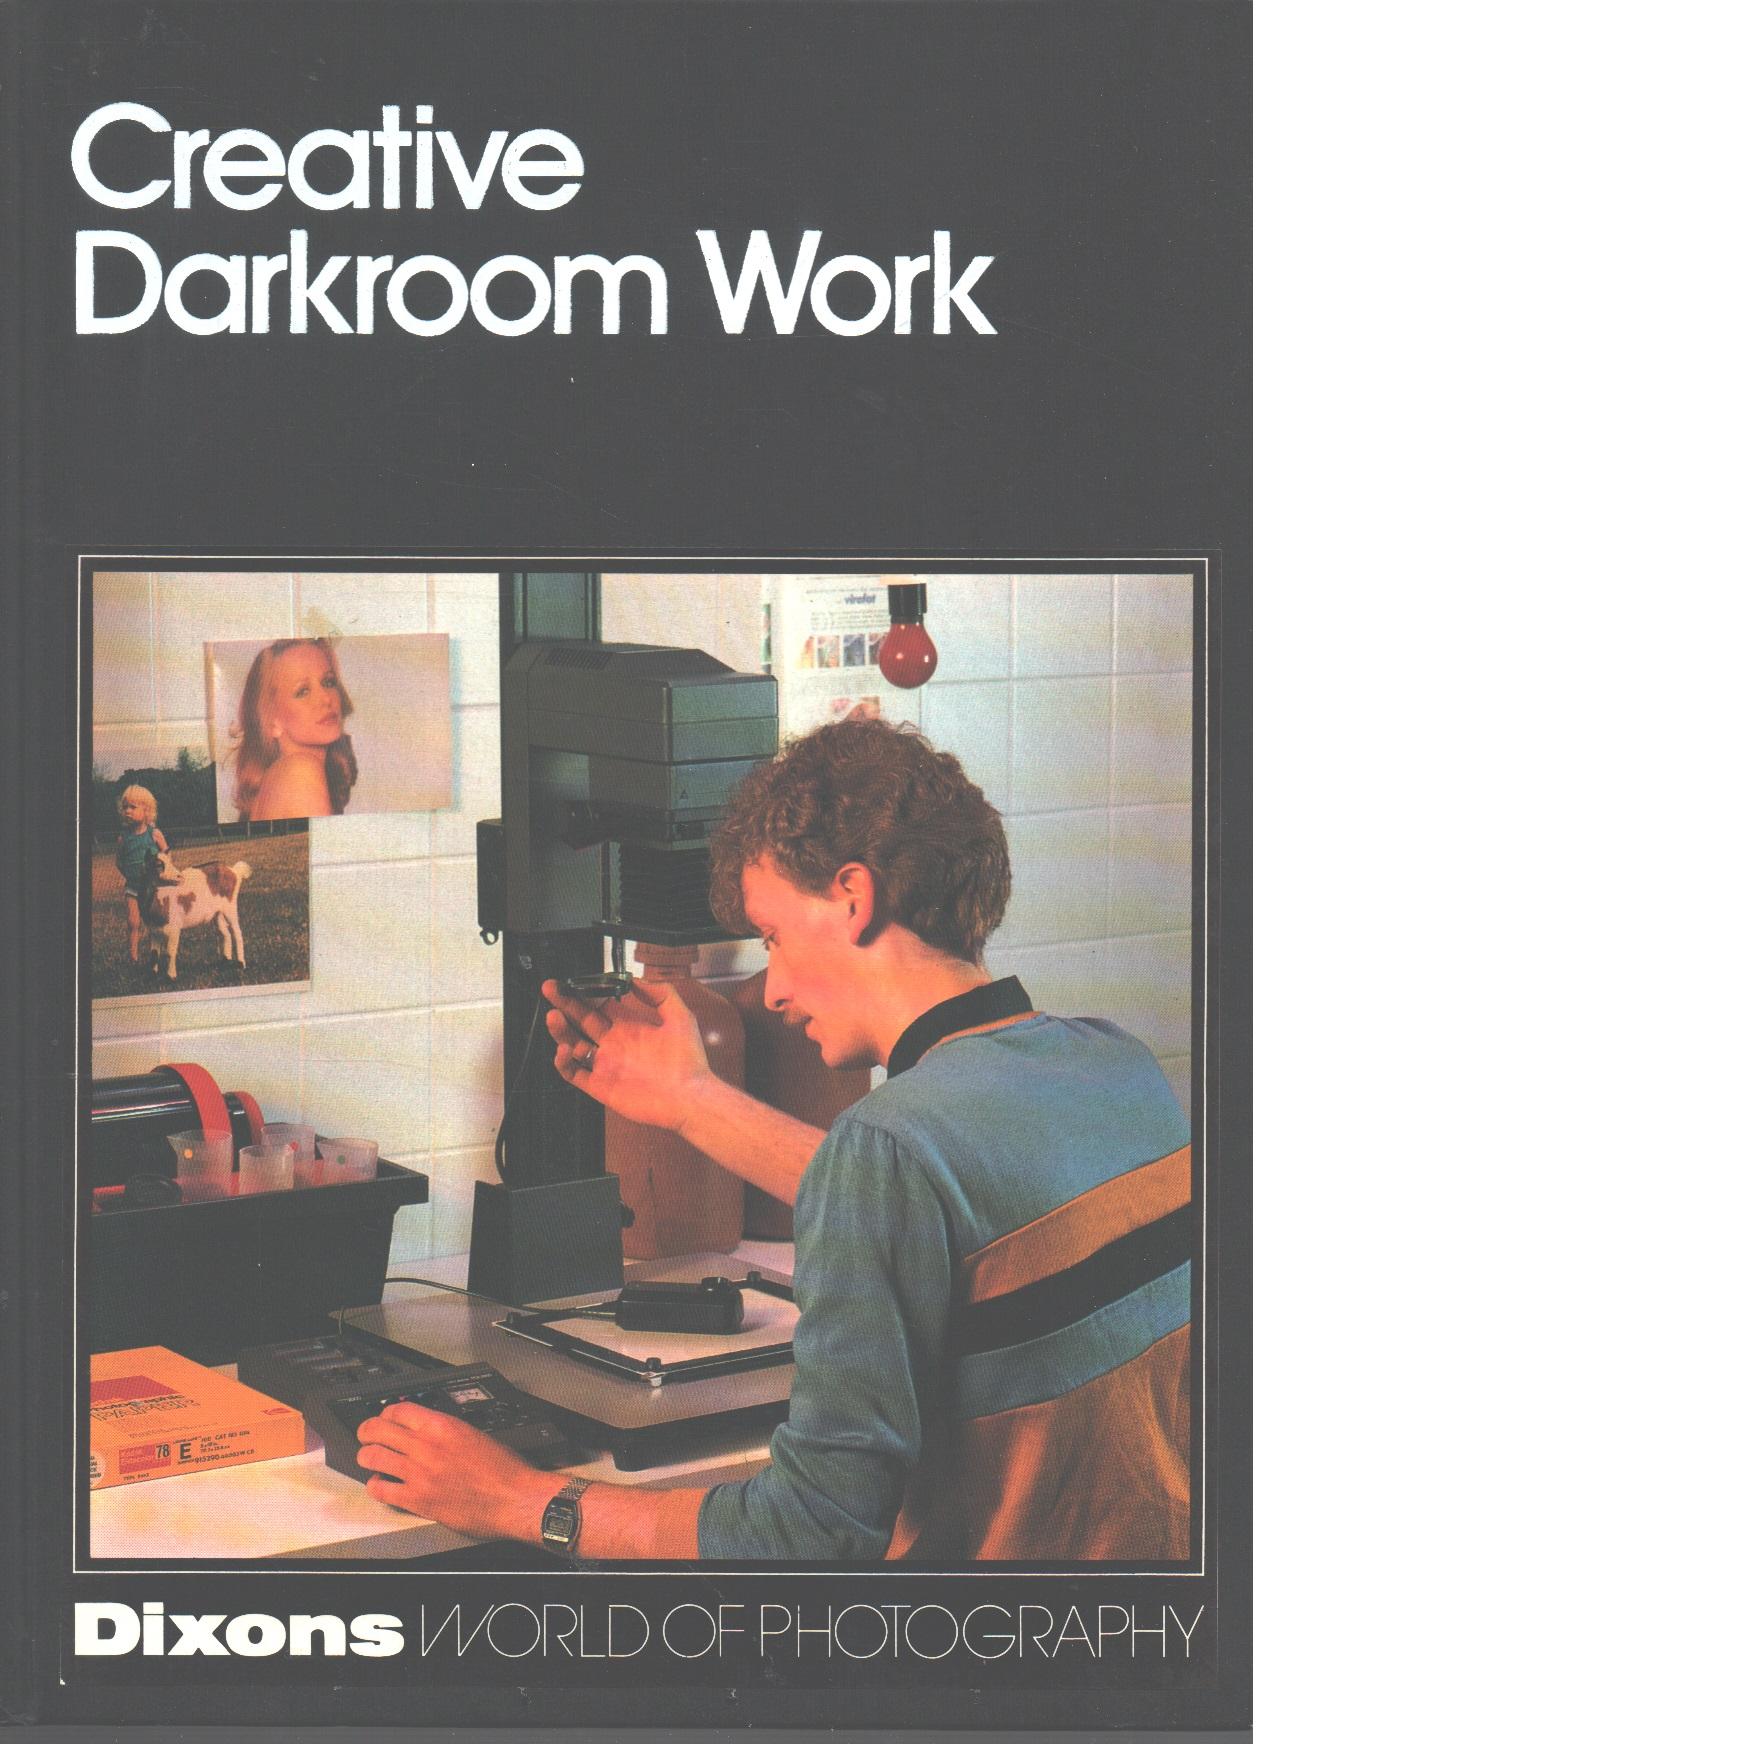 Dixons world of photography : Creative Darkroom Work - Red.